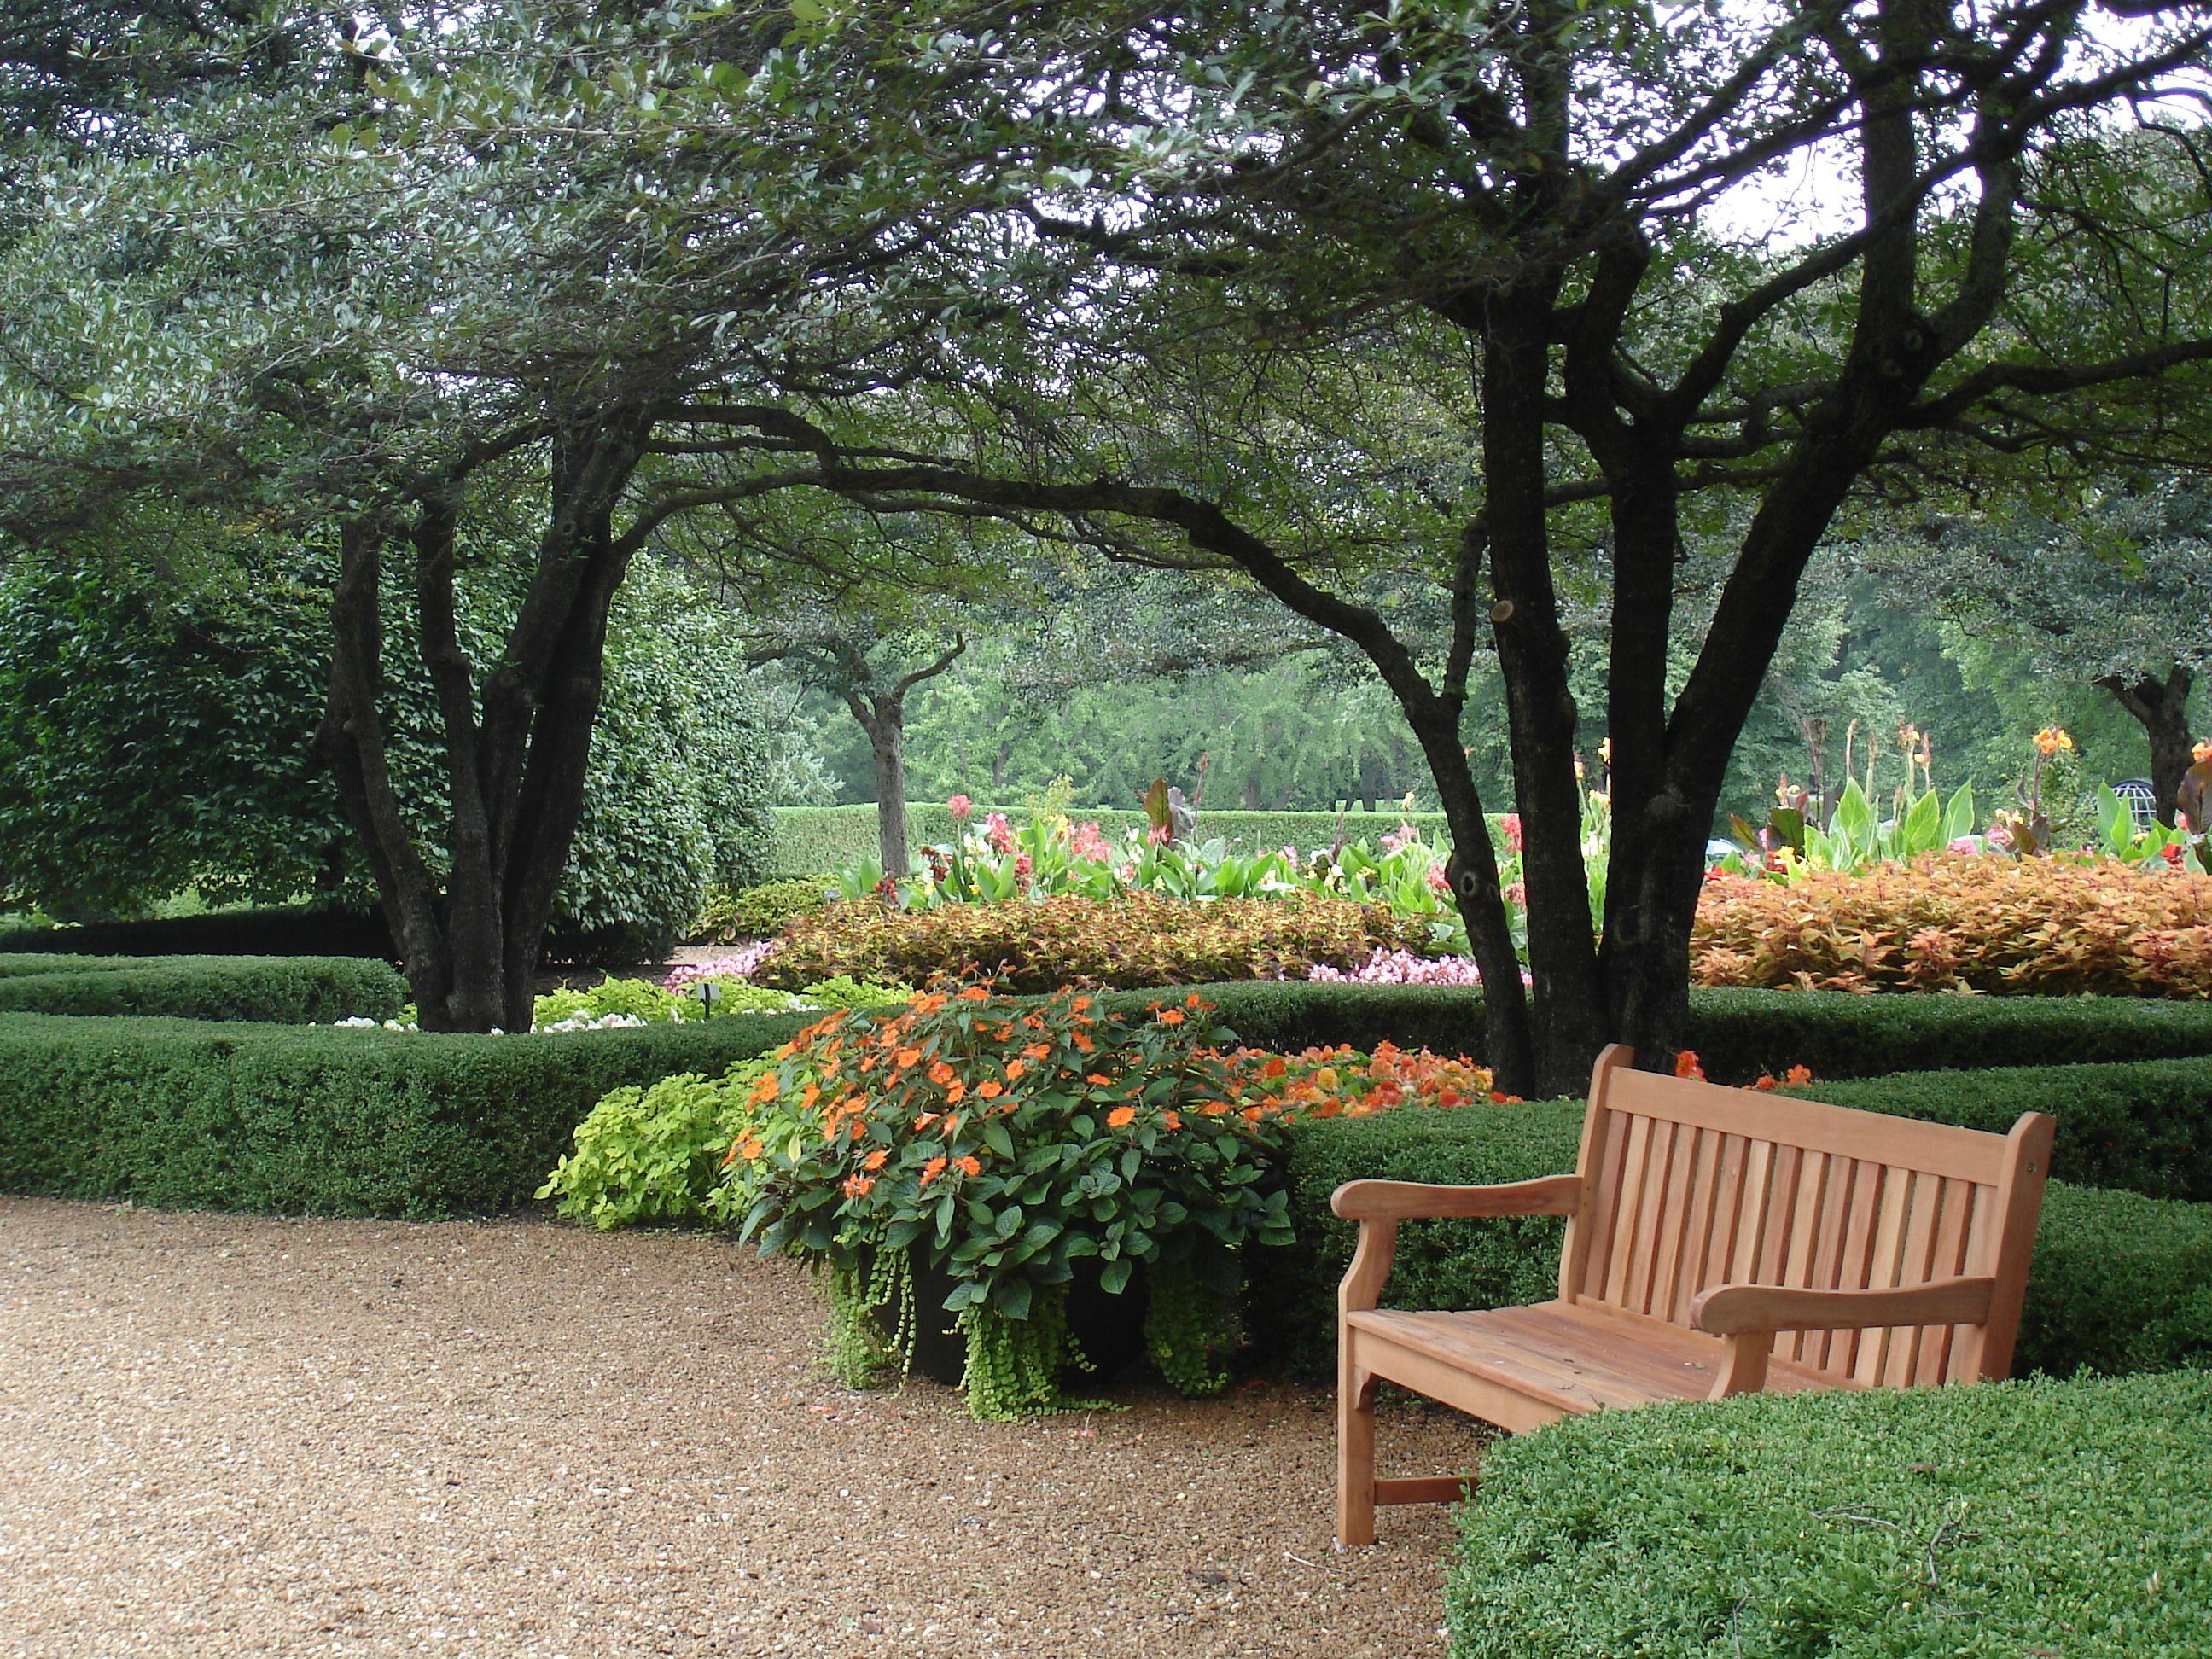 Bur oak garden peace prayer forgiveness garden ideas for Prayer garden designs